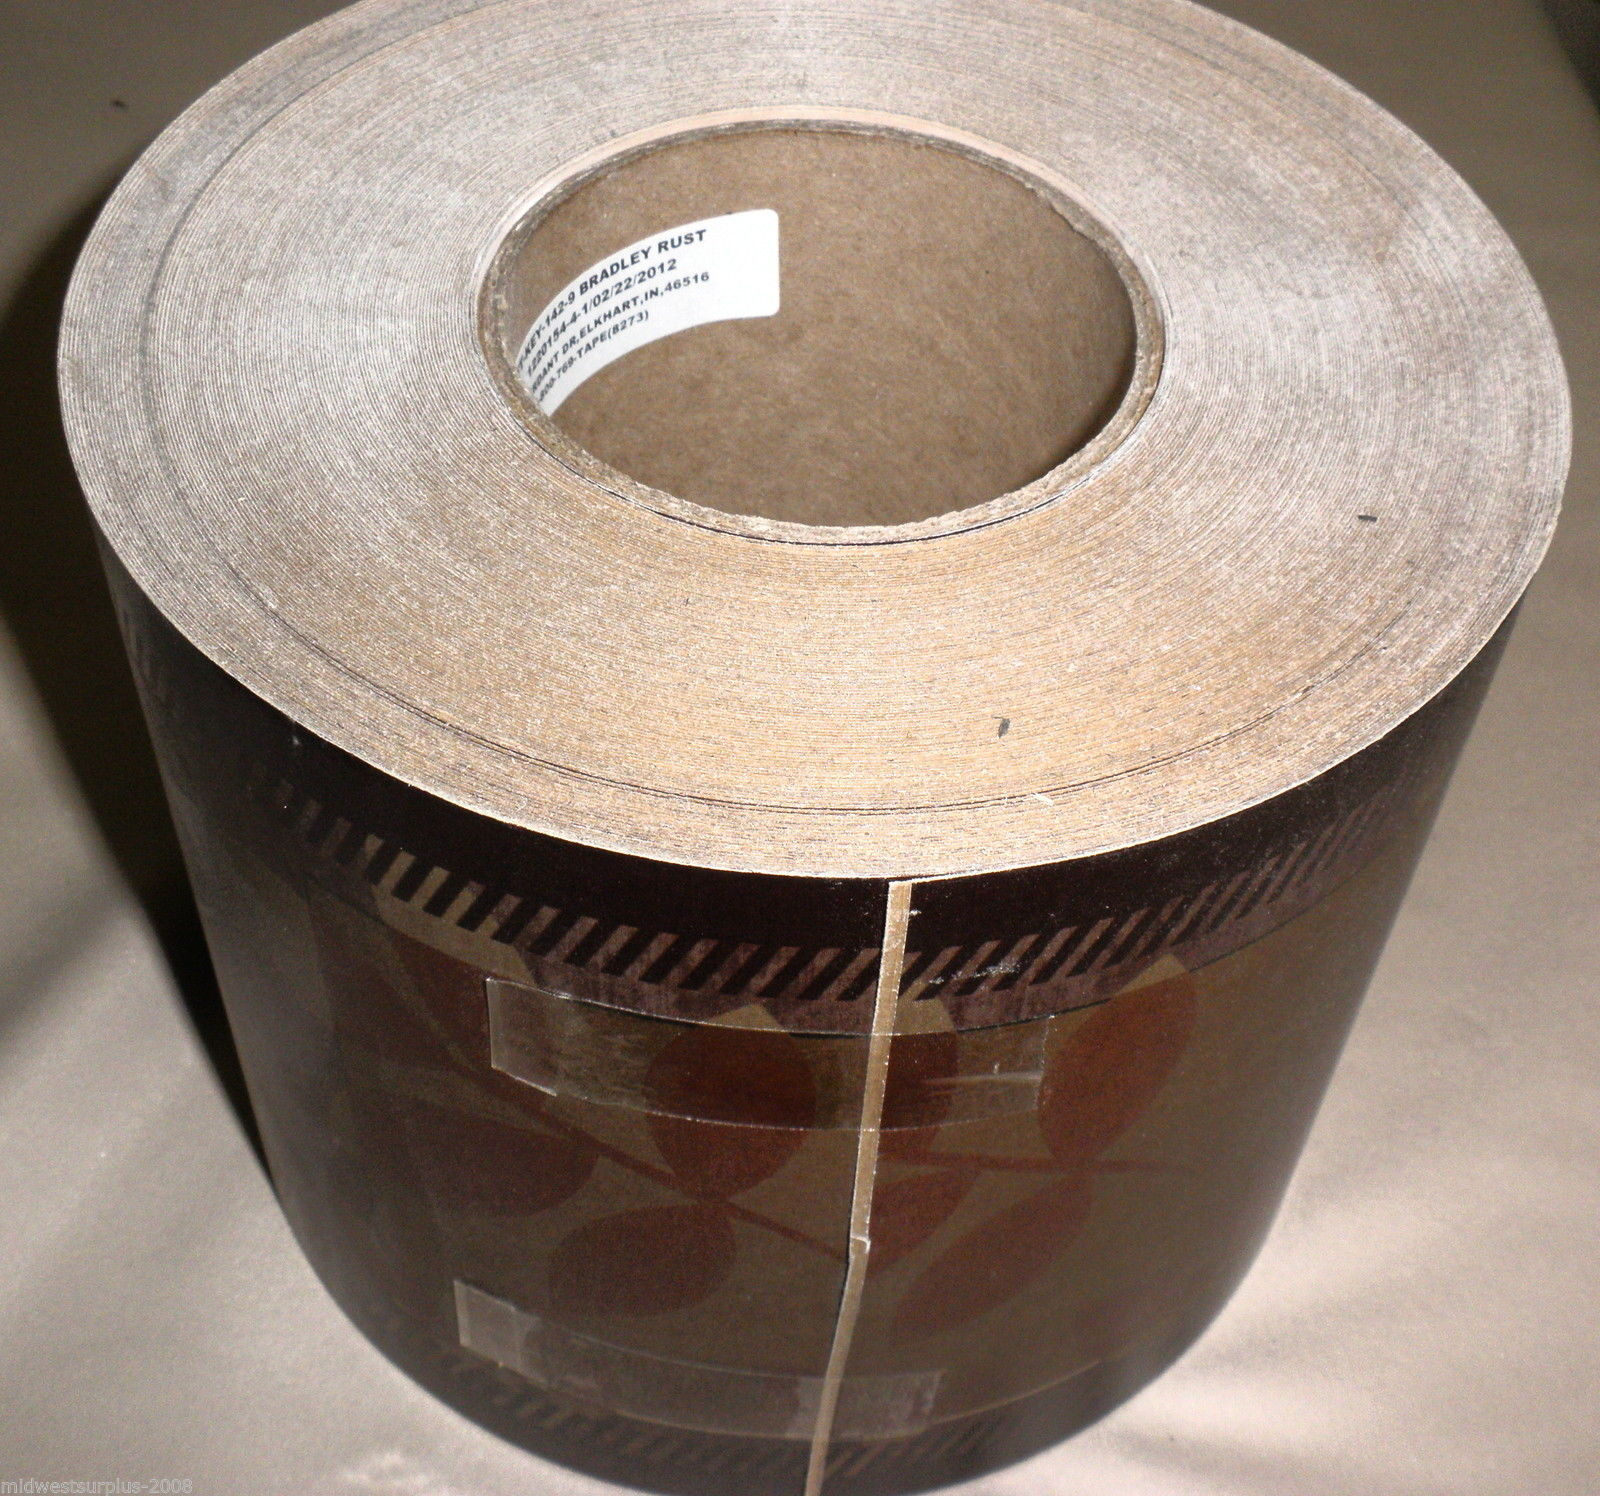 "Tape Technologies / Keystone Bradley Rust 6"" Self Adhesive Wallpaper Border"